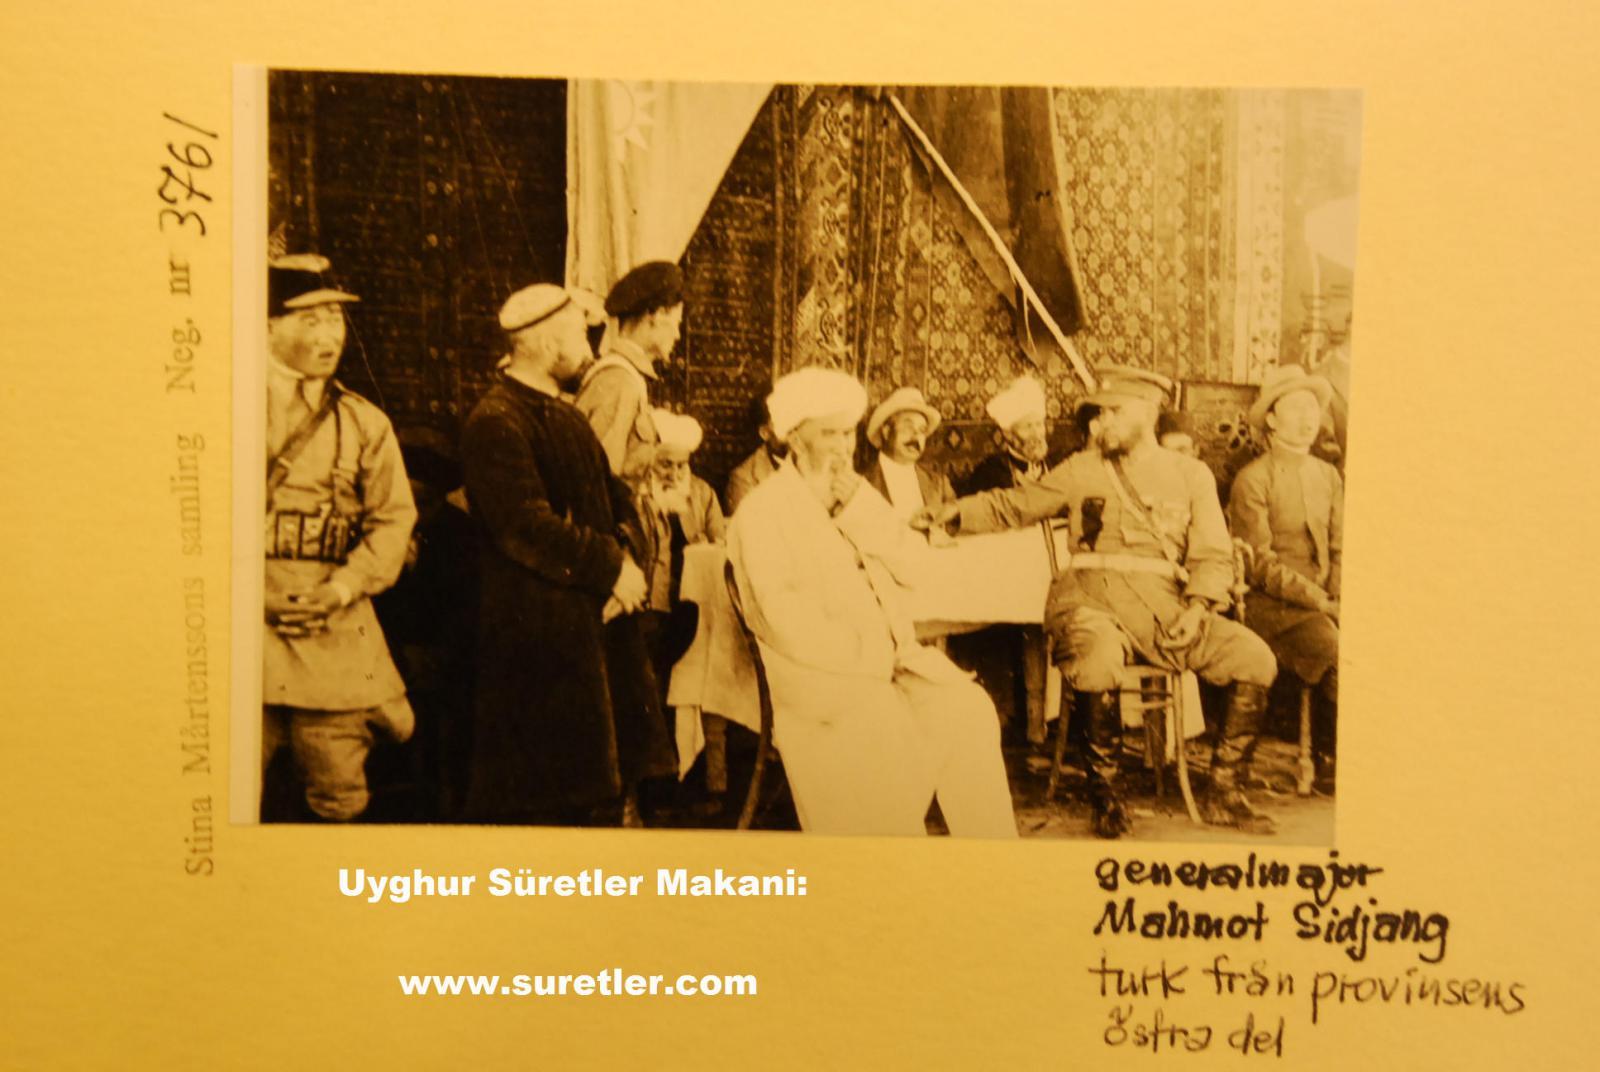 Генерал 30-х годов Махмут Мухити